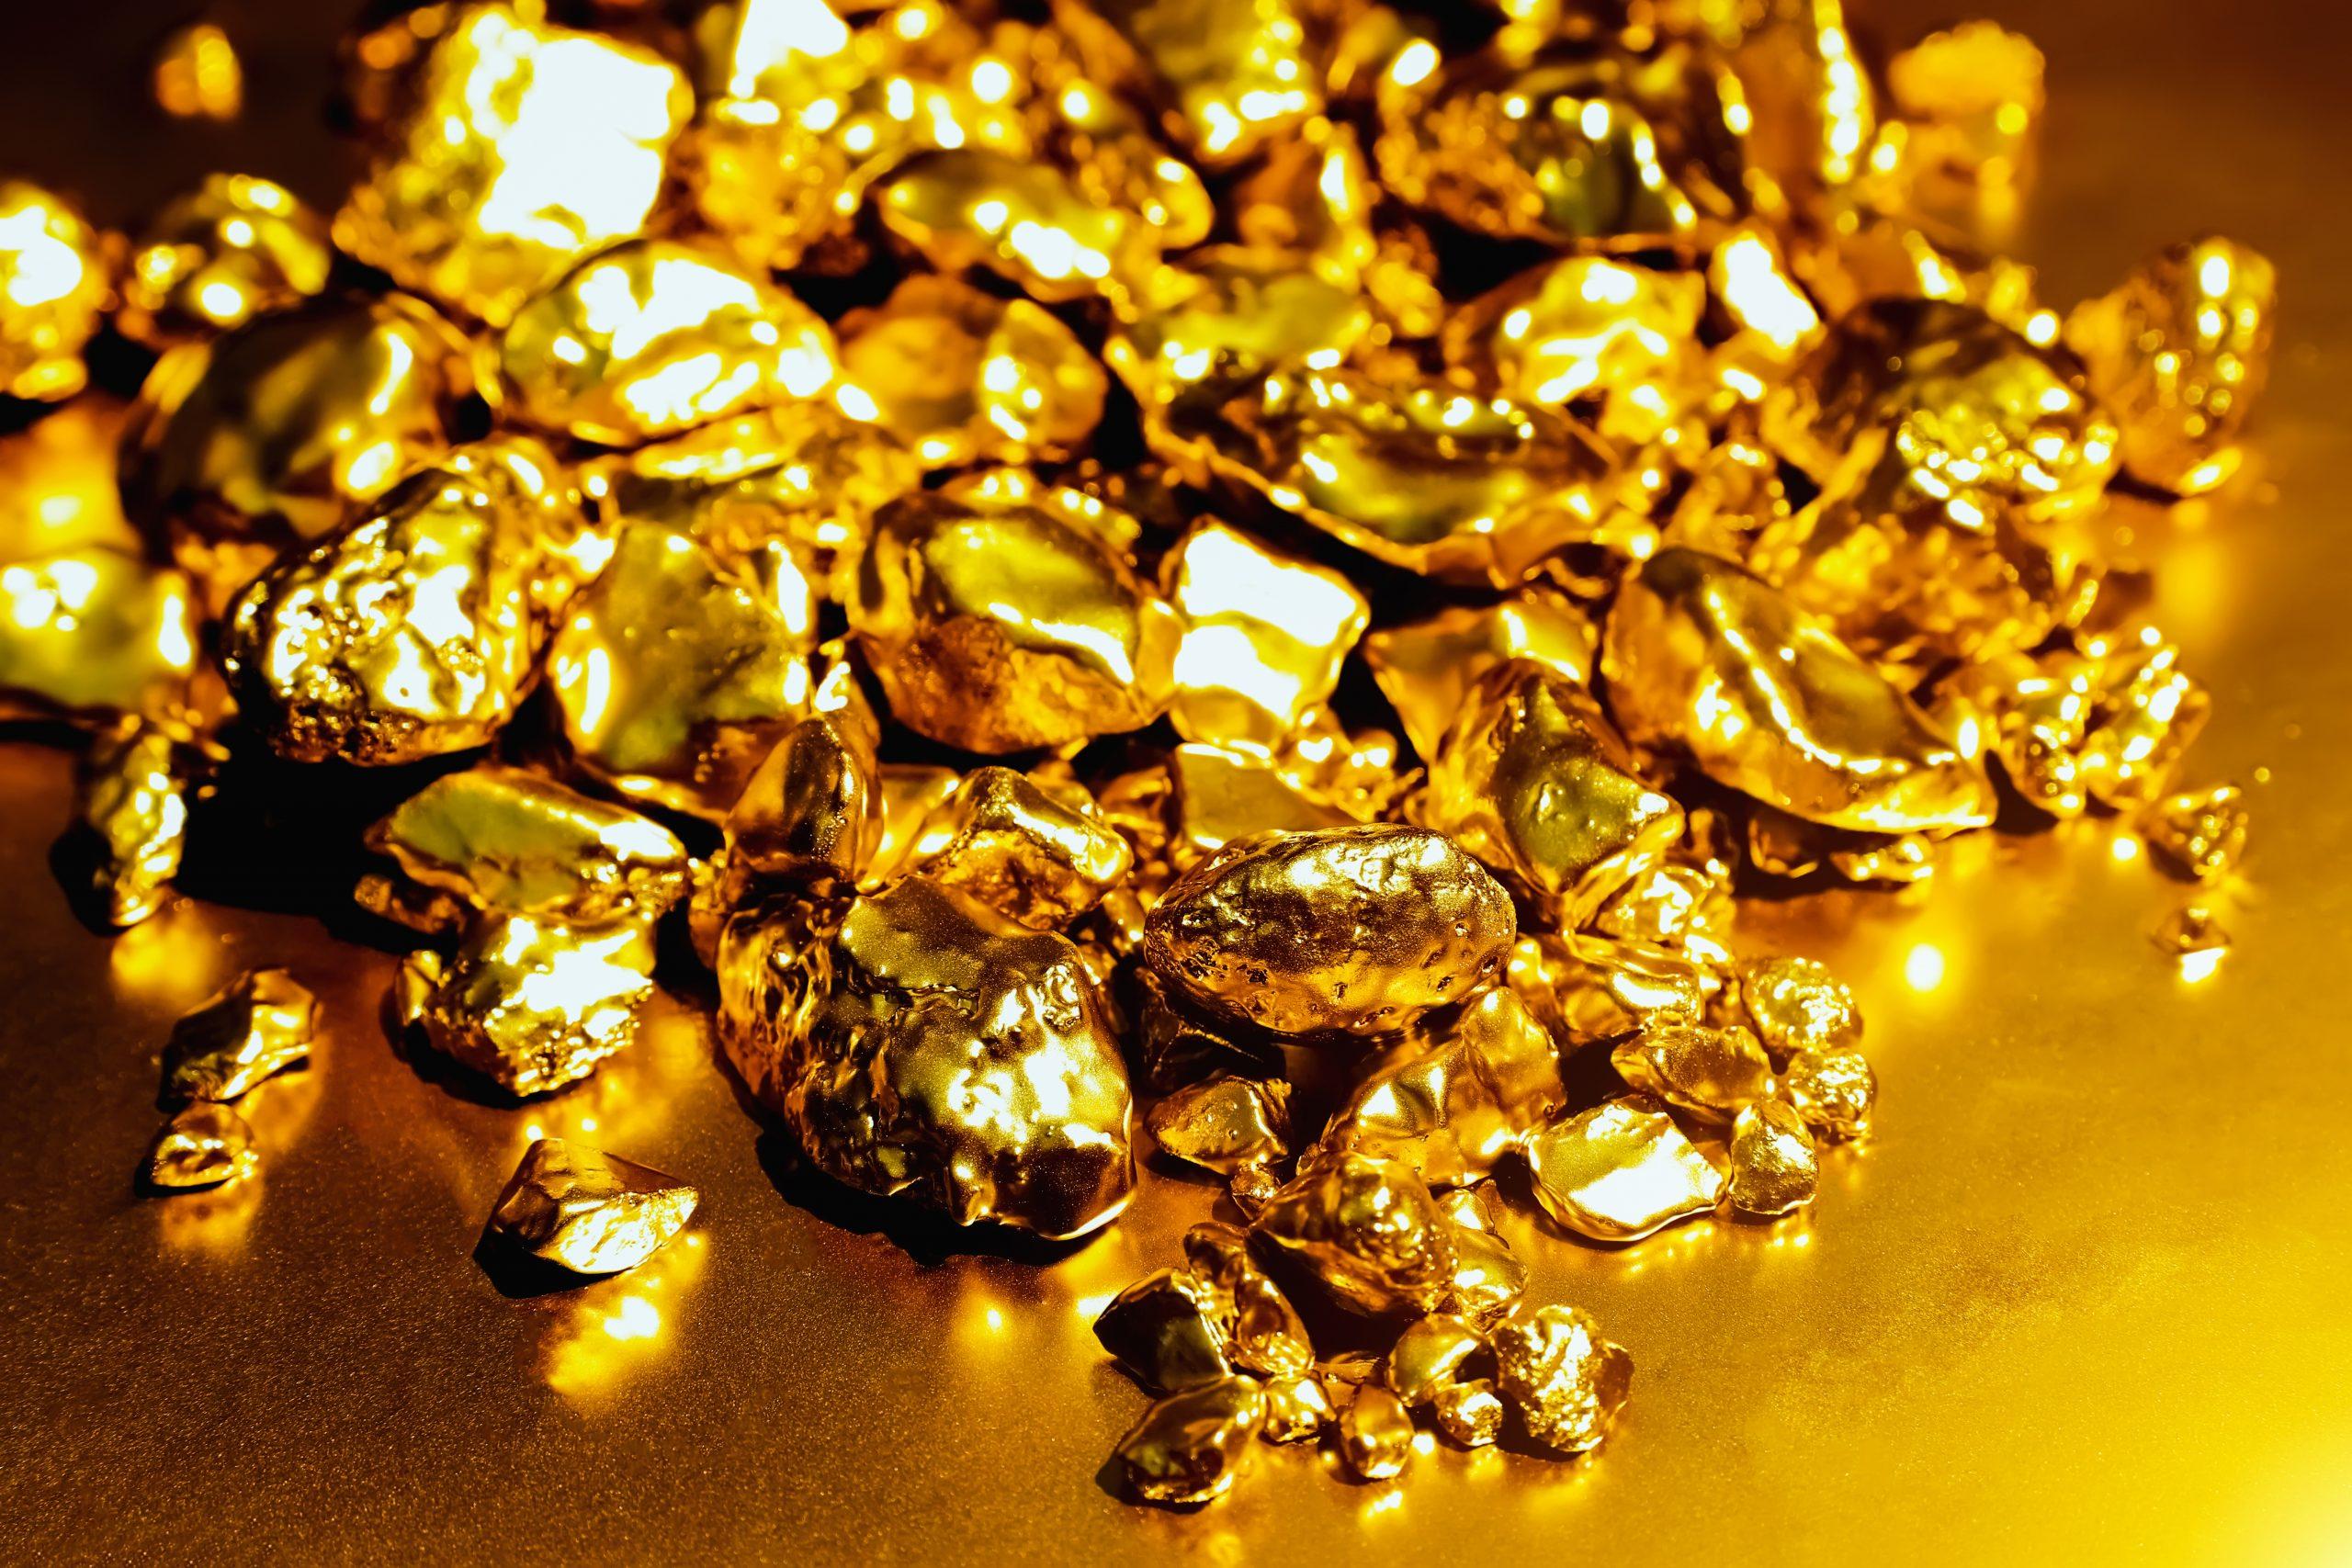 monaco resources monacoresources monaco-resources group mrgmonacoresources monacoresourcesmrg